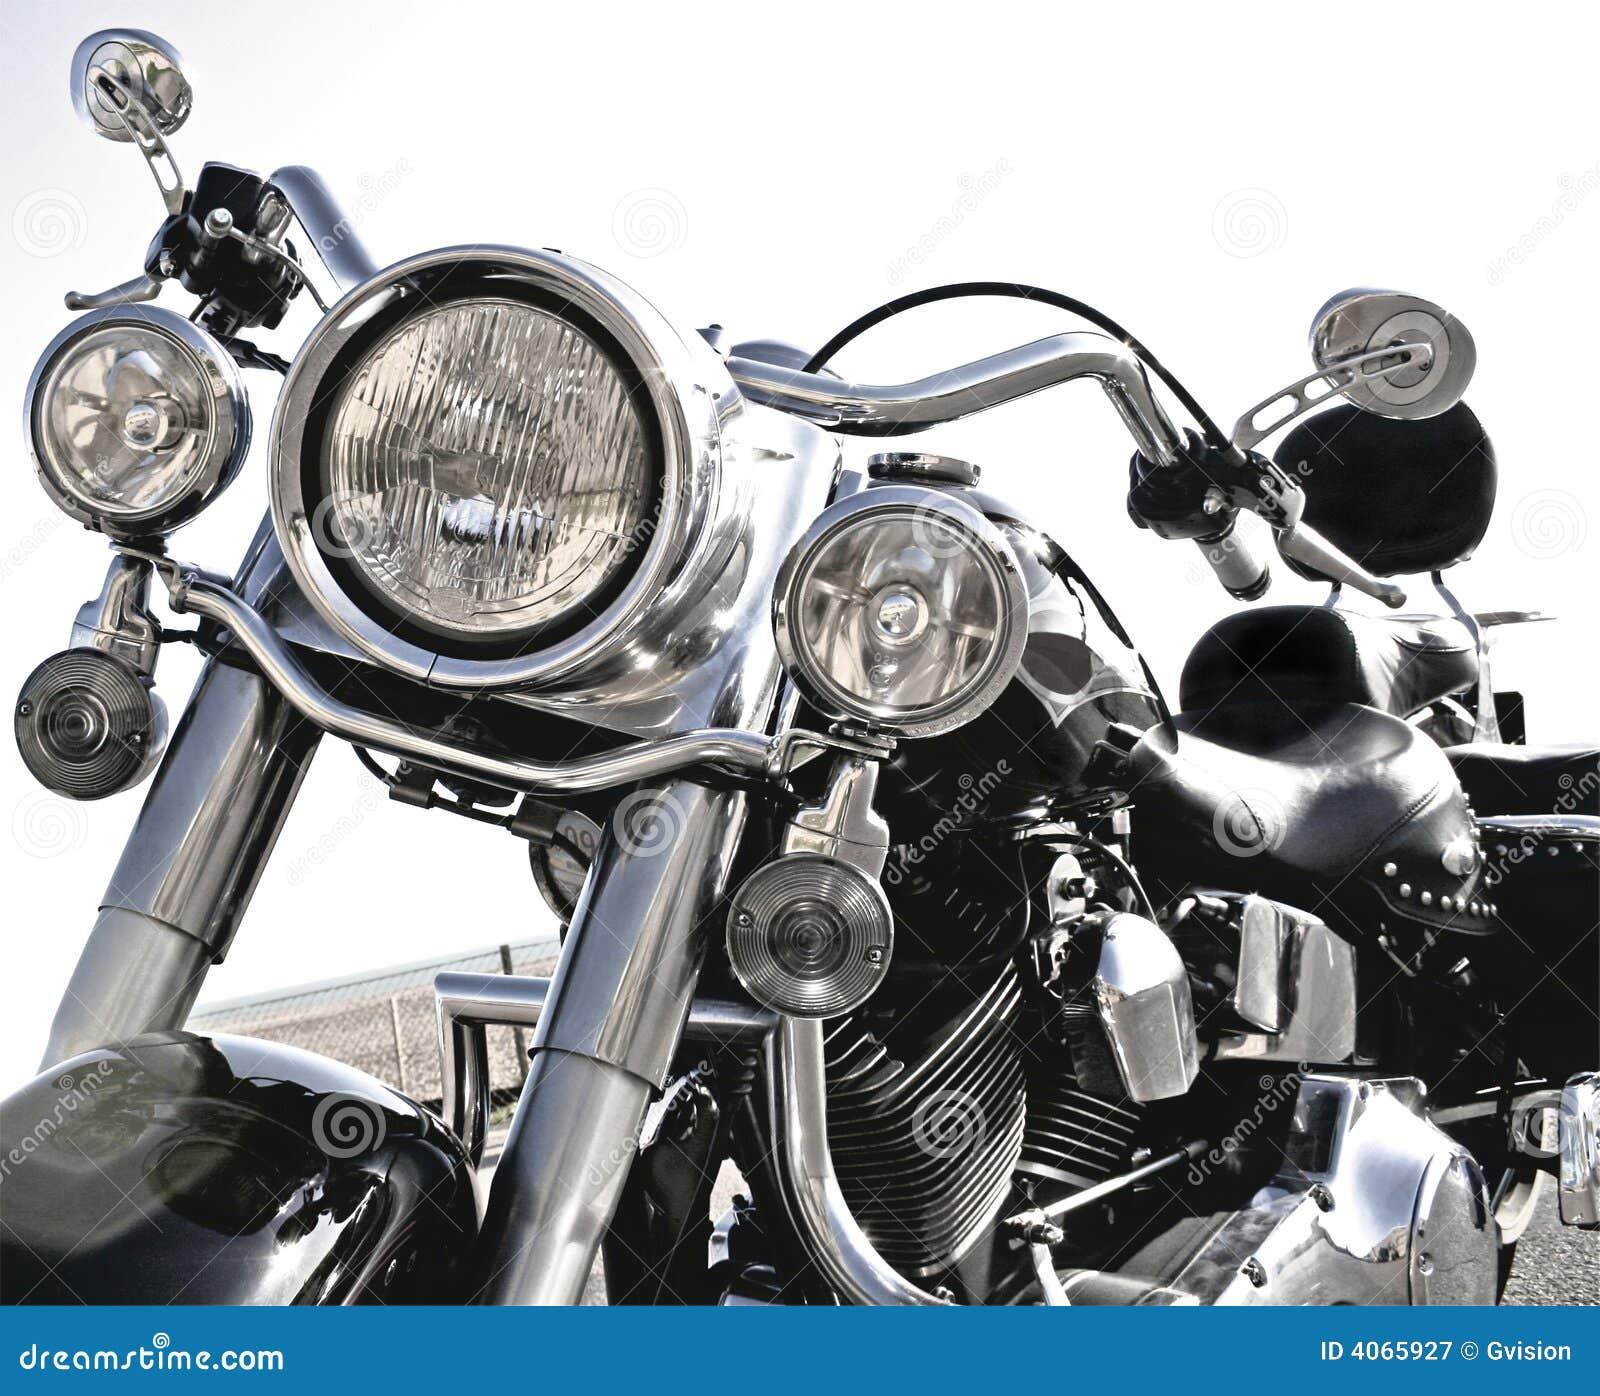 Cool Harley